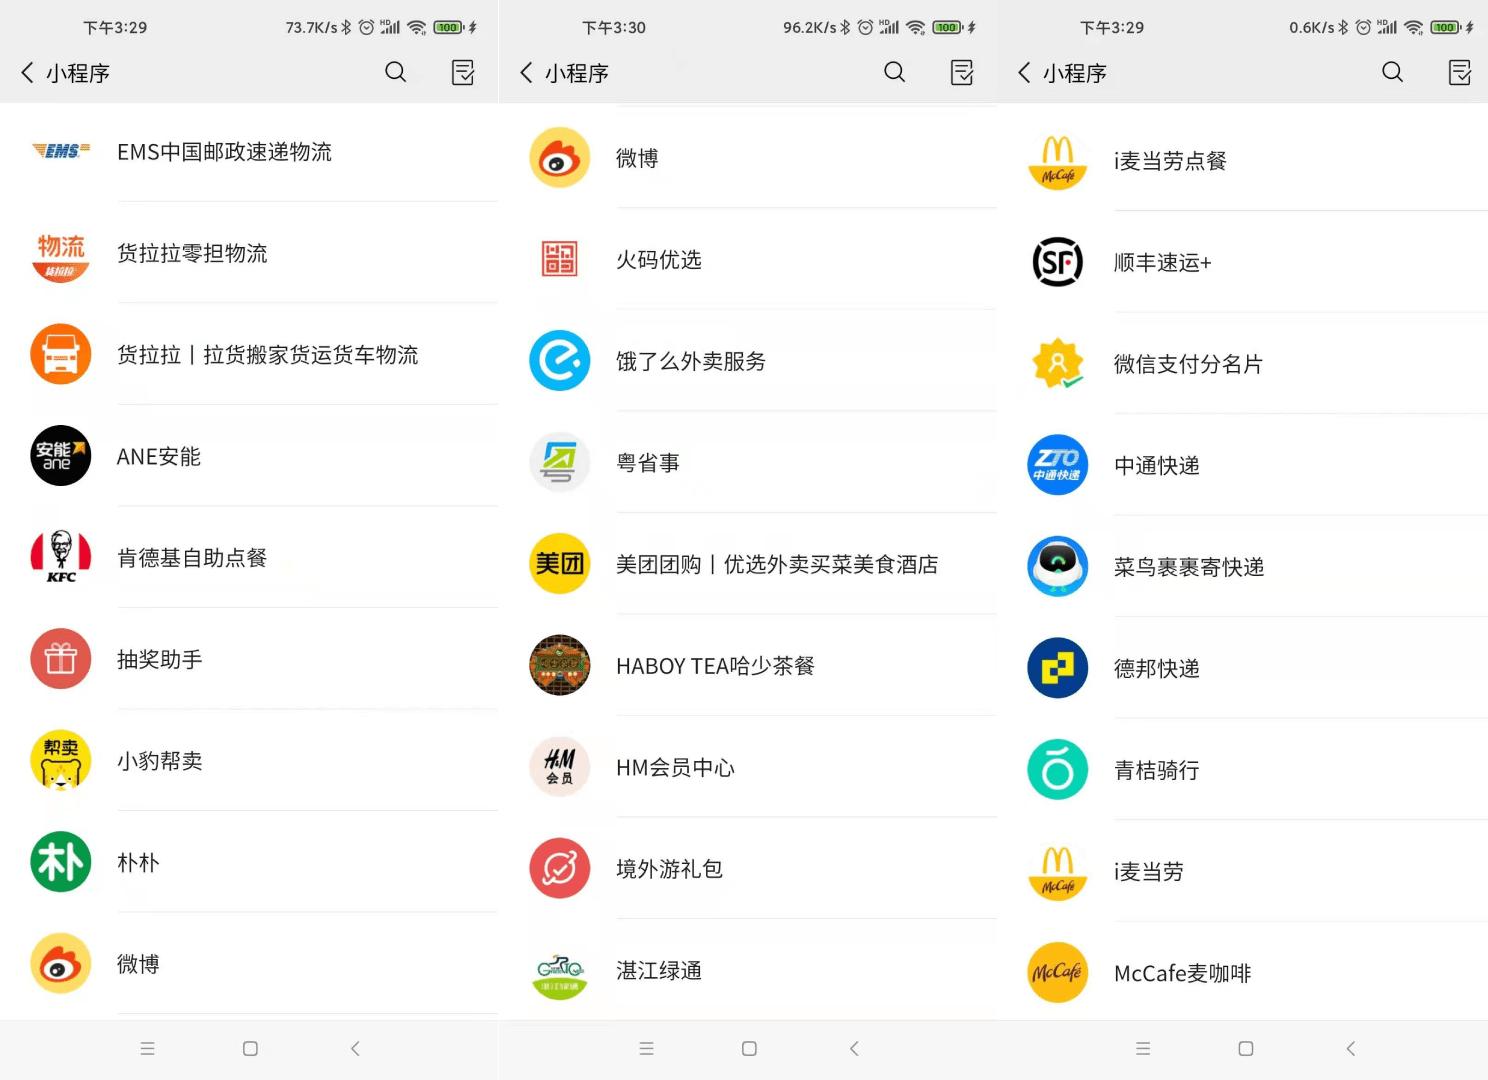 App为何频繁更新?了解这些关键信息后,我彻底无语